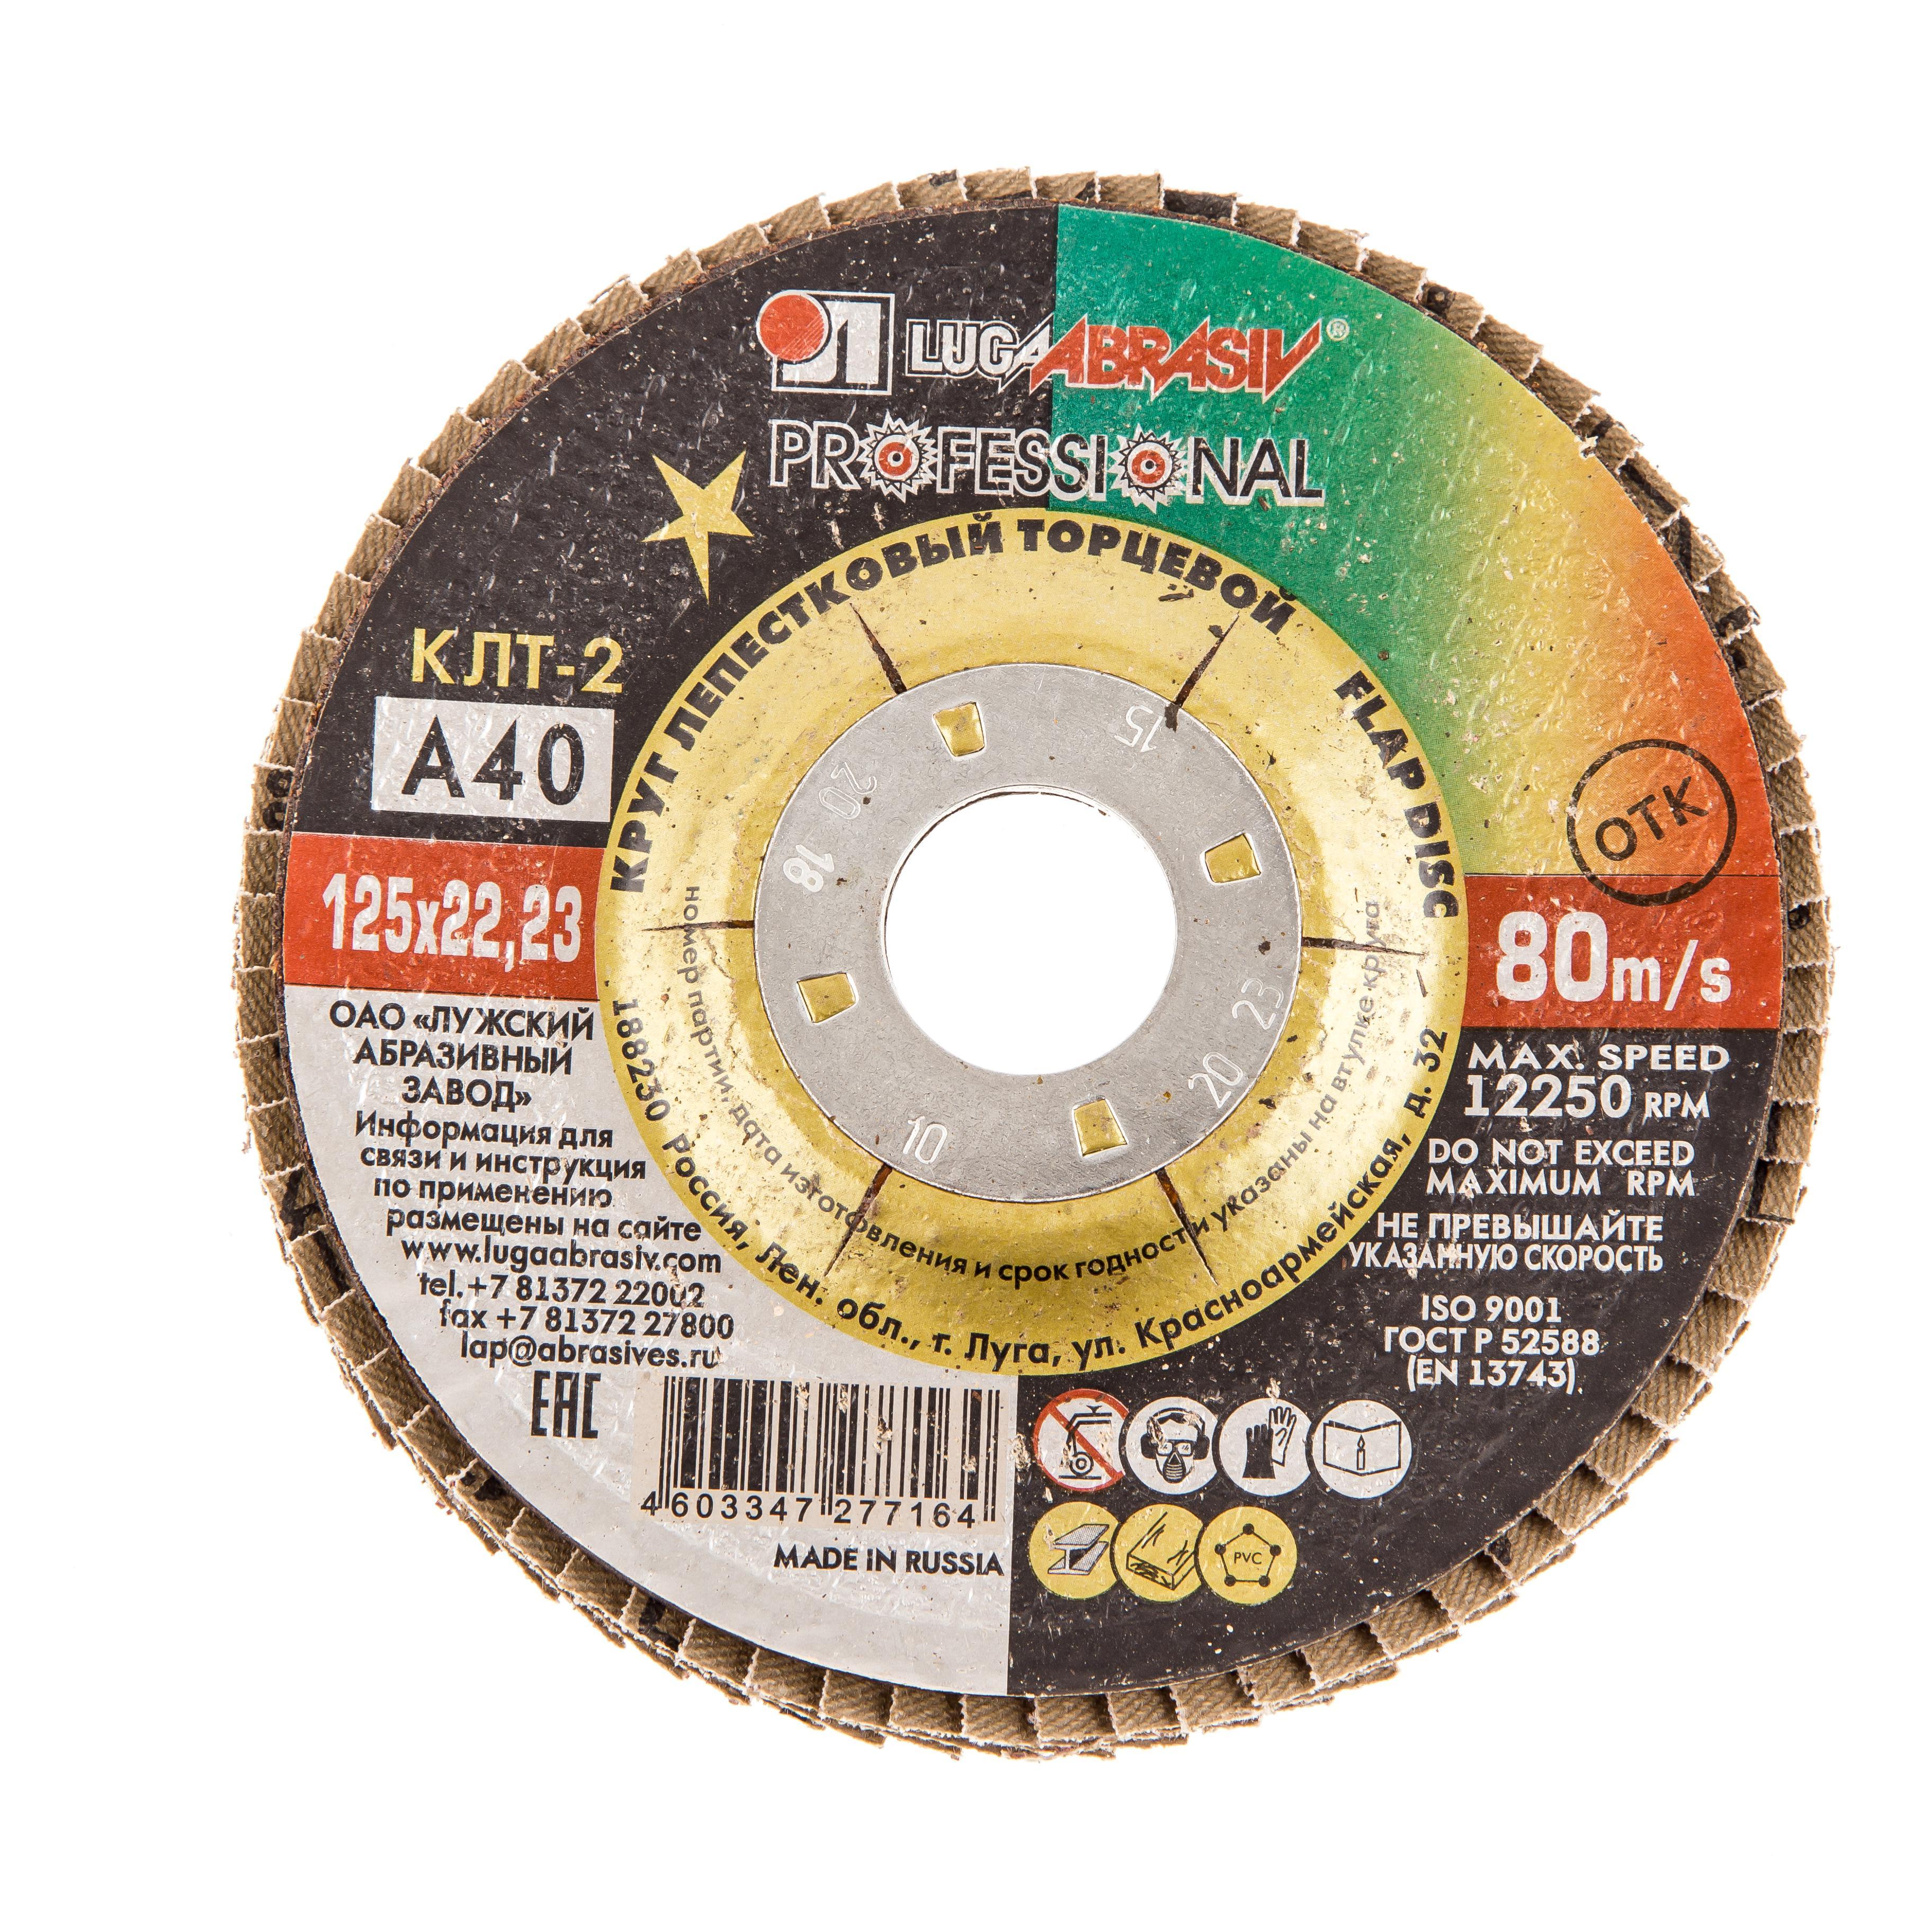 Круг Лепестковый Торцевой (КЛТ) ЛУГА-АБРАЗИВ КЛТ2 125 Х 22 Р 40 (№40) круг лепестковый торцевой клт hammer flex клт 180 х 22 р 40 40шт